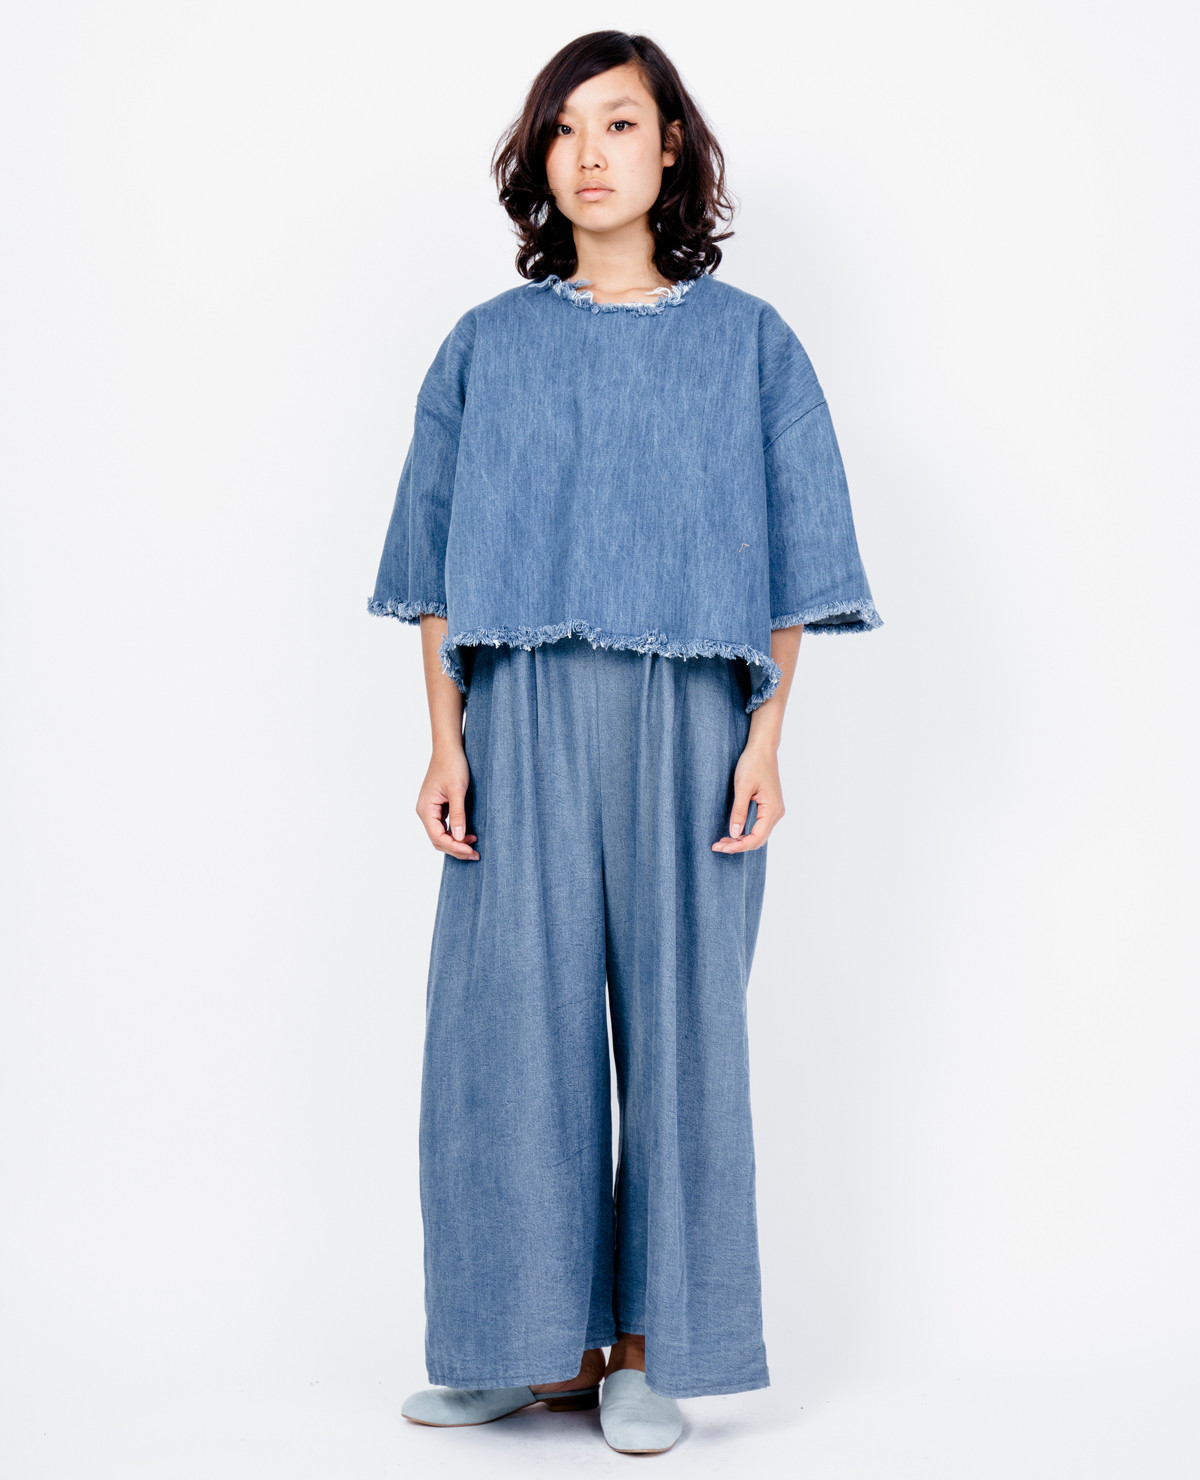 Sarah Bentley Clothing: Ashley Rowe Tee Shirt / Medium Denim In Blue (Medium Denim